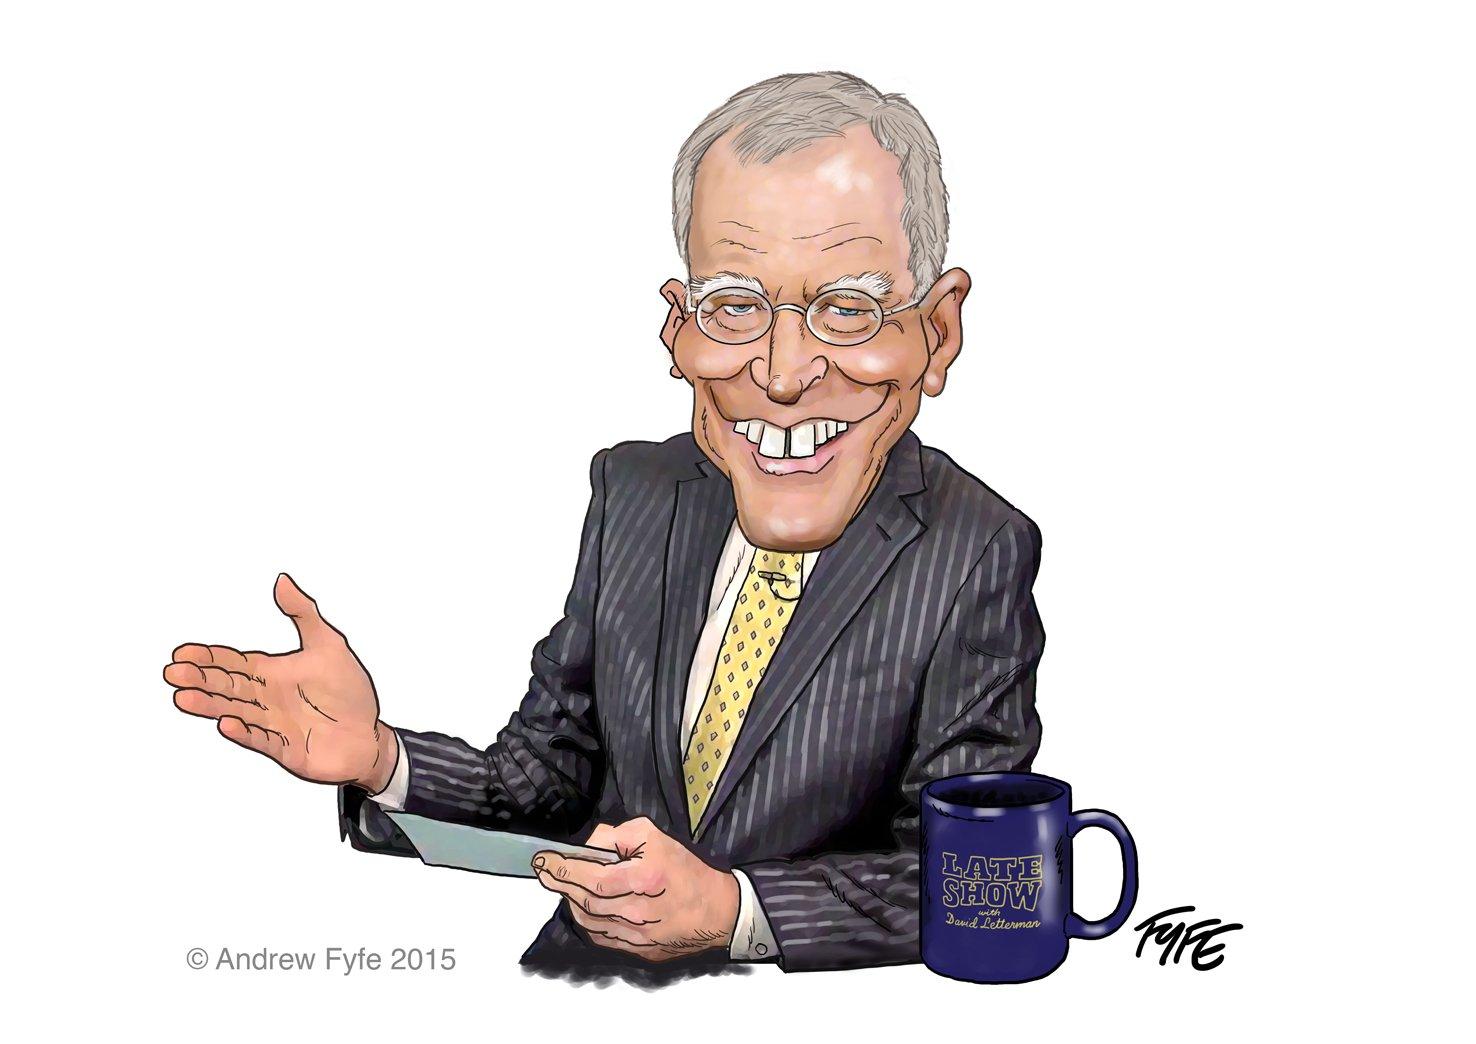 David Letterman caricature, David Letterman cartoon, David Letterman, Late Show with David Letterman